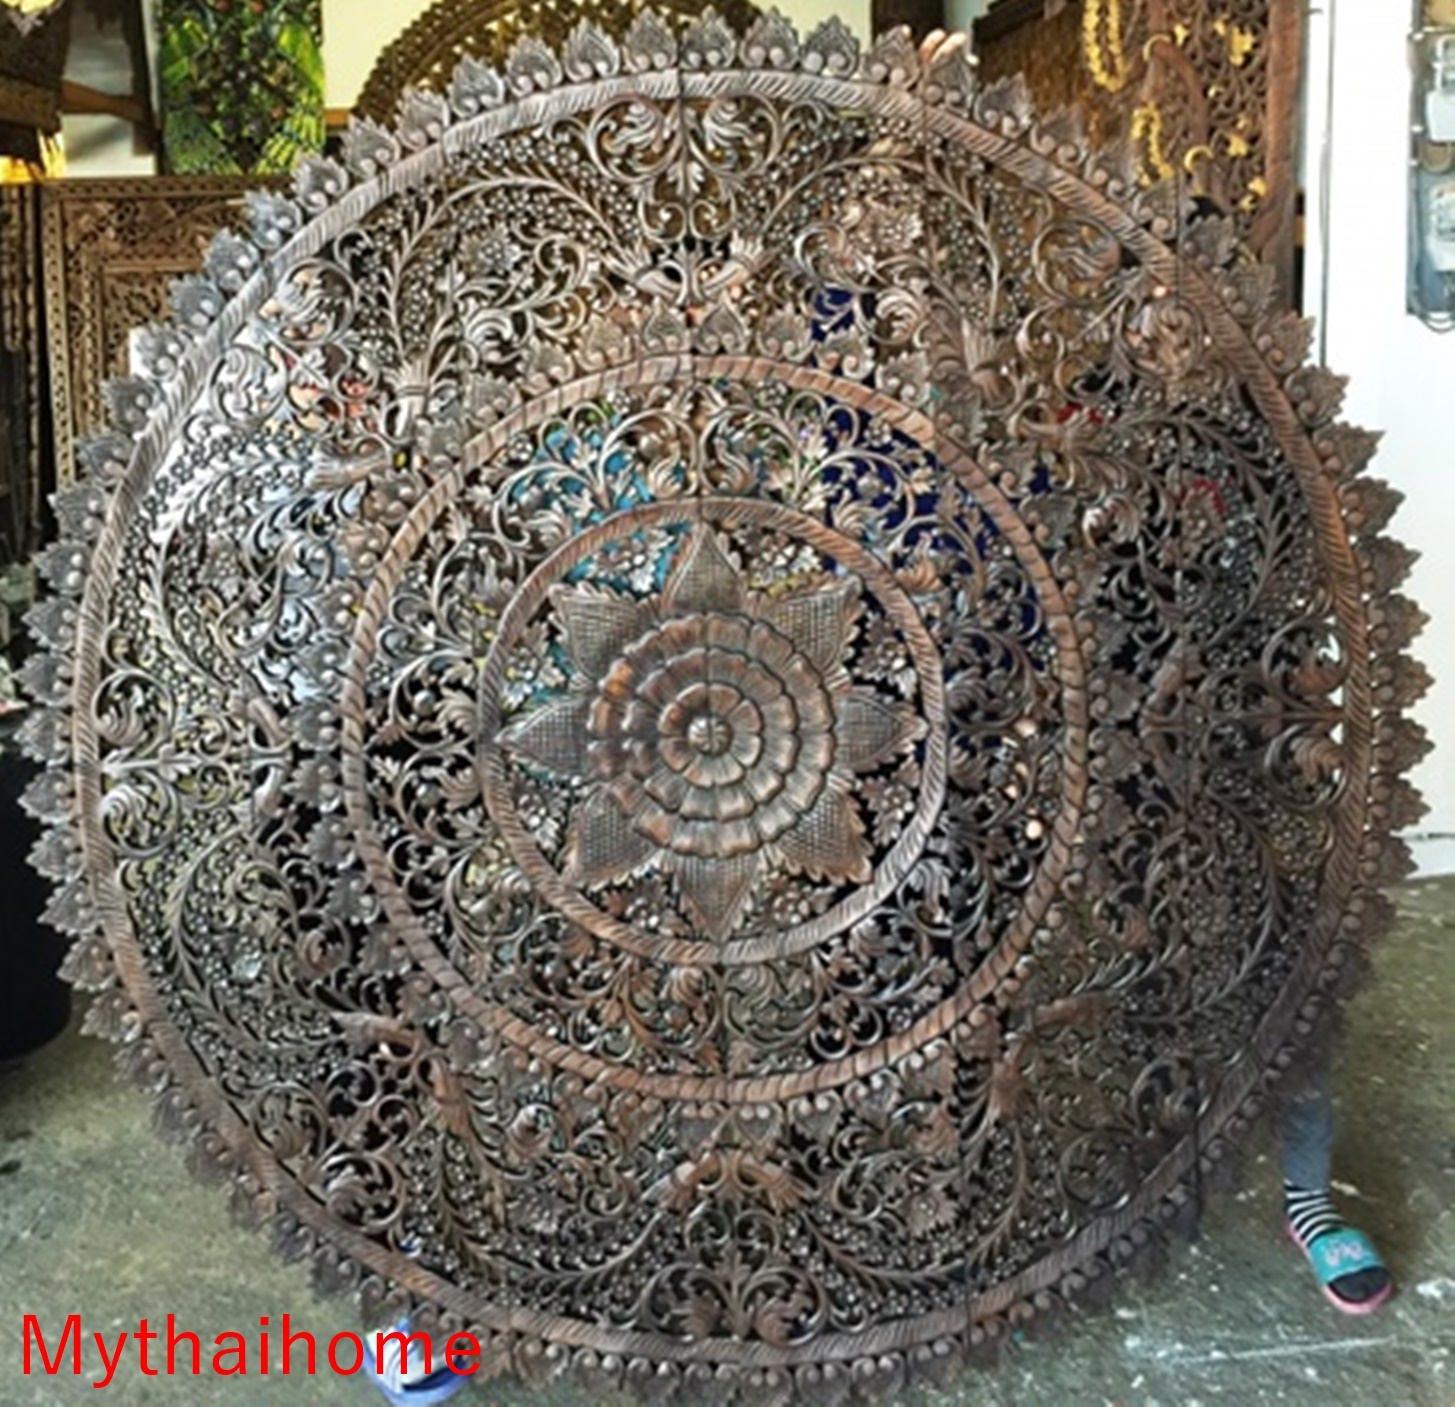 Runde Kingsize Bett Kopfteil 6ft Lotus Blume Mandala Aus Holz Hand Sehnte  Carving Teak Holz Braun Weiß Kunst Panel Wand Home Decor Thai Große